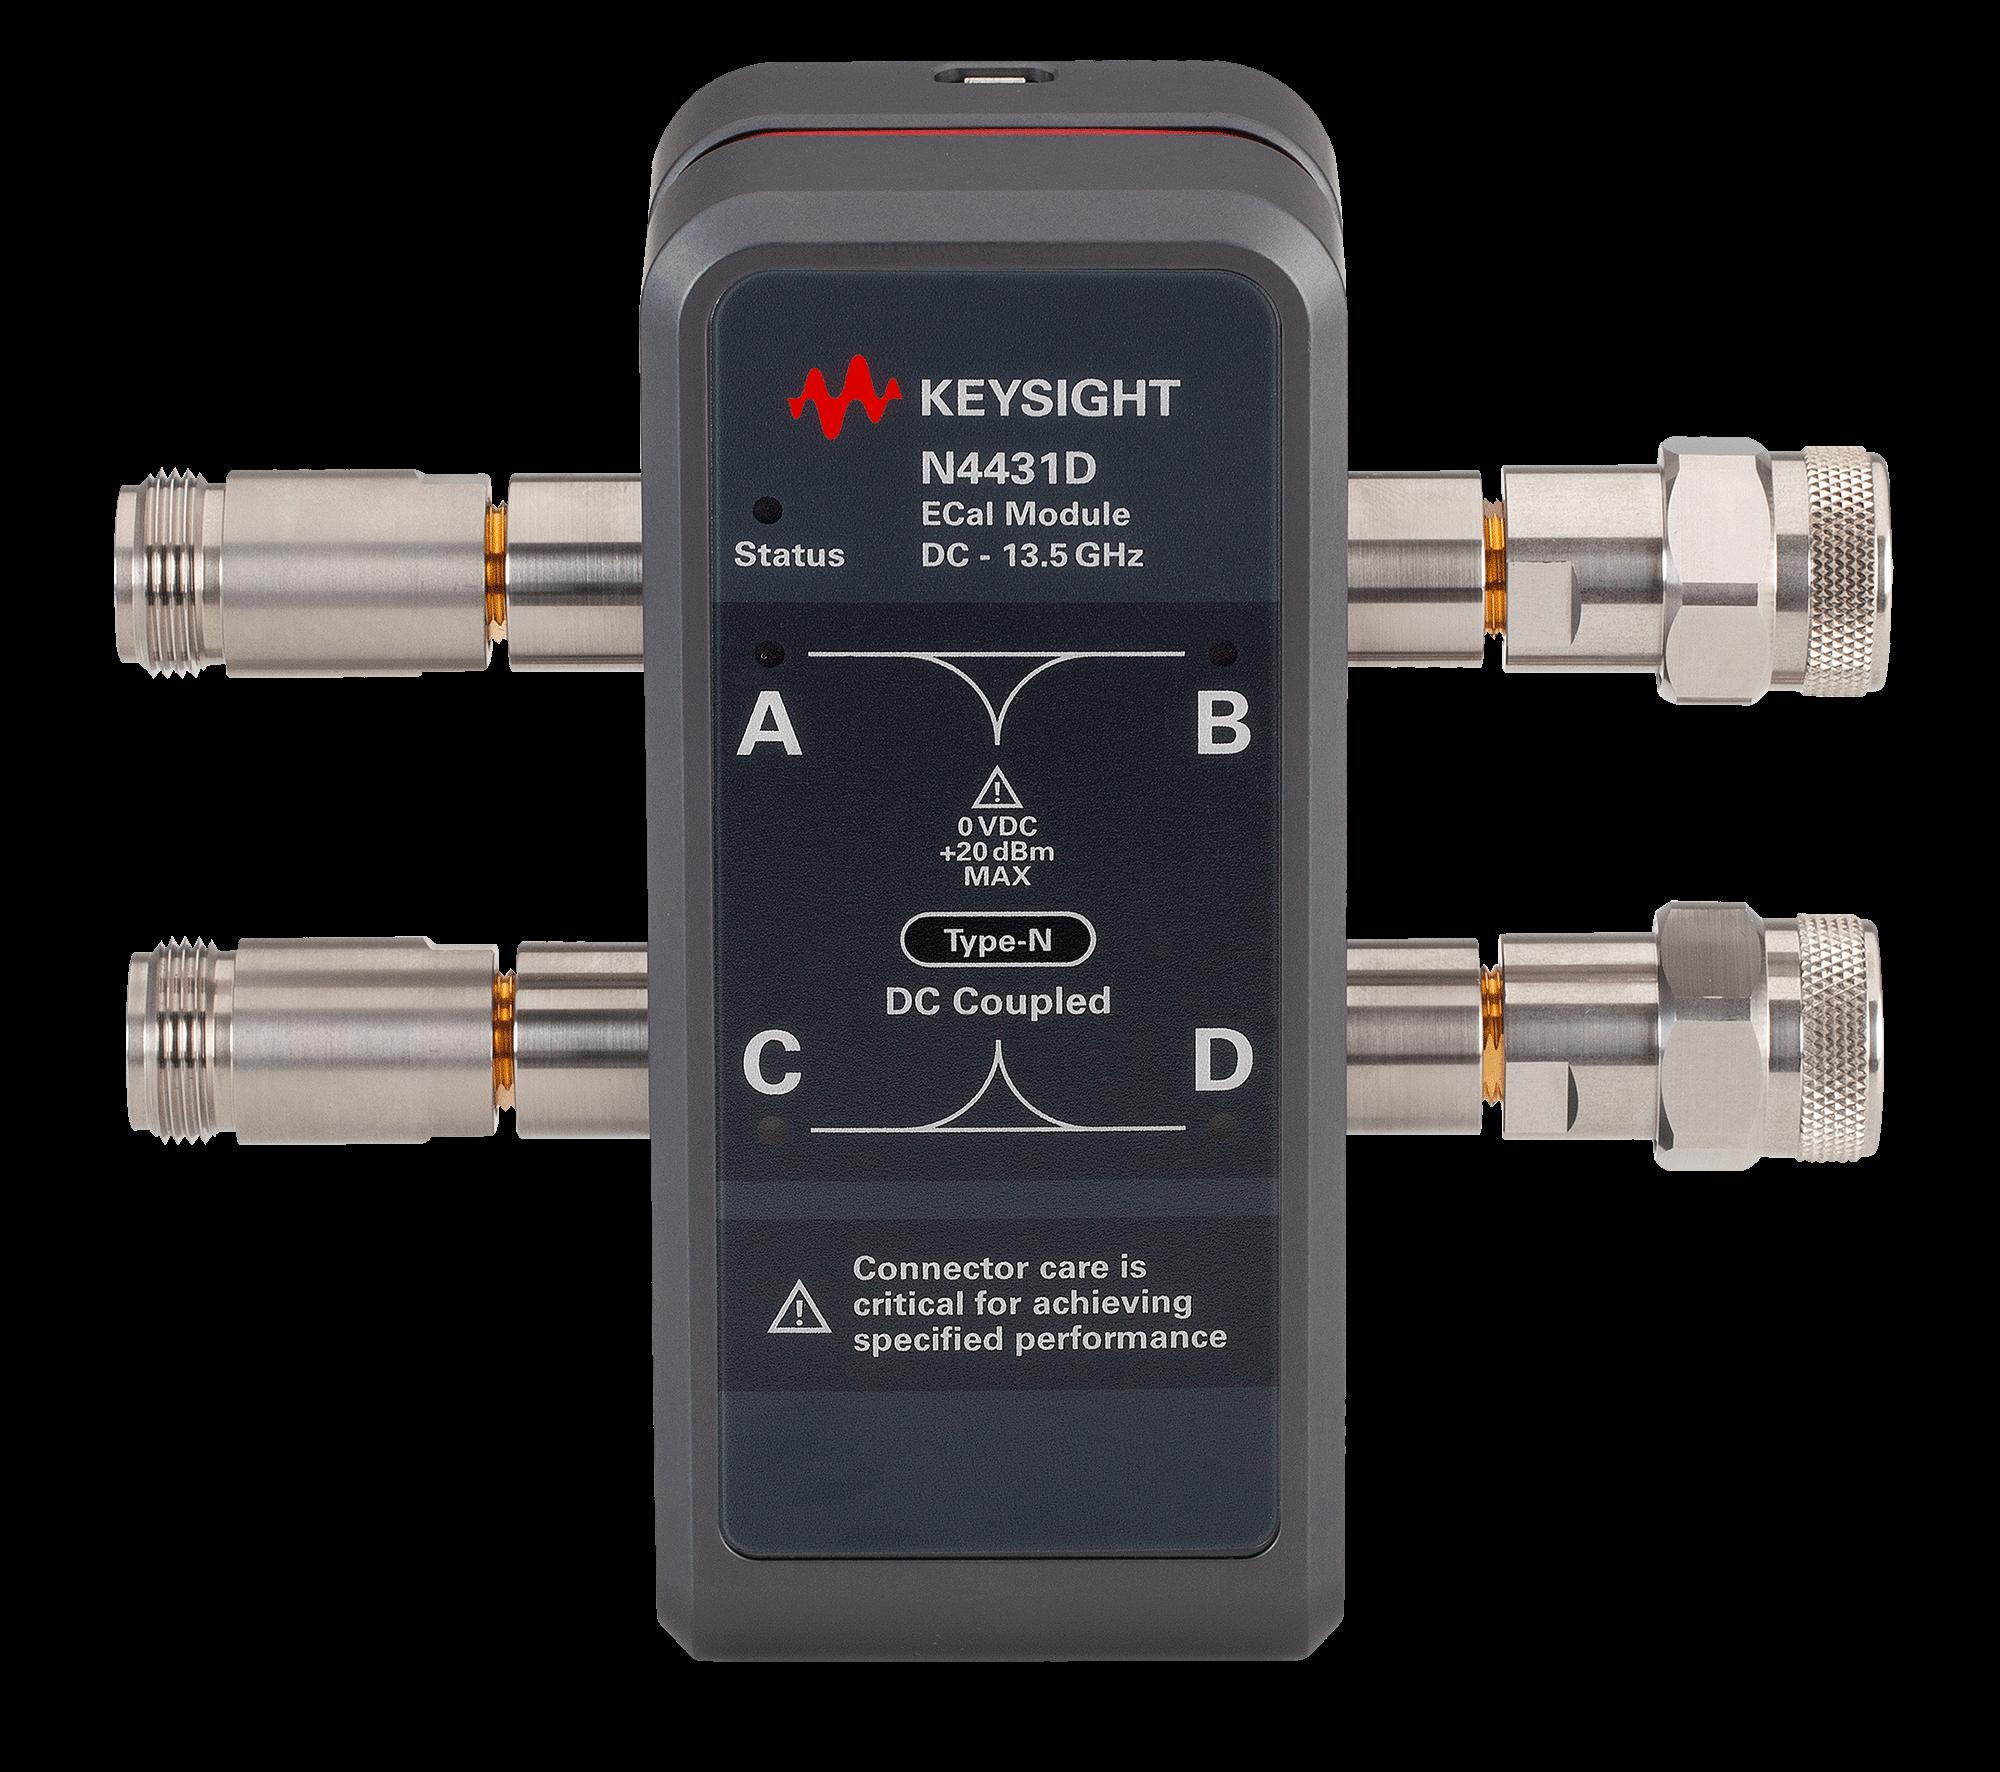 N4431D RF Electronic Calibration Module (ECal), DC to 13.5 GHz, 4-ports |  Keysight